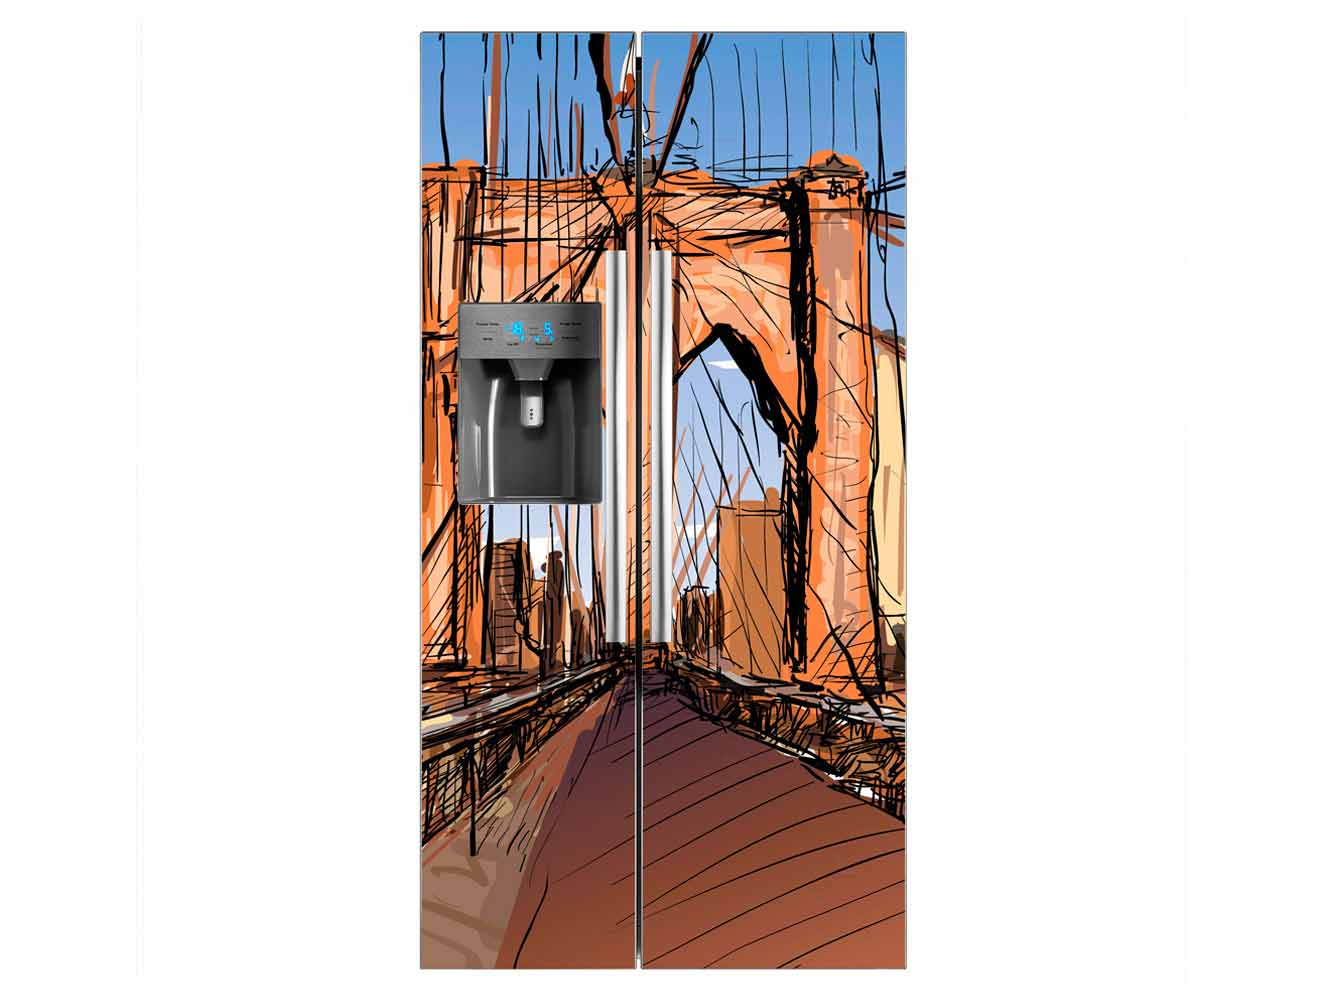 Vinilo Frigorífico Americano Puente Acuarela | Carteles XXL - Impresión carteleria publicitaria